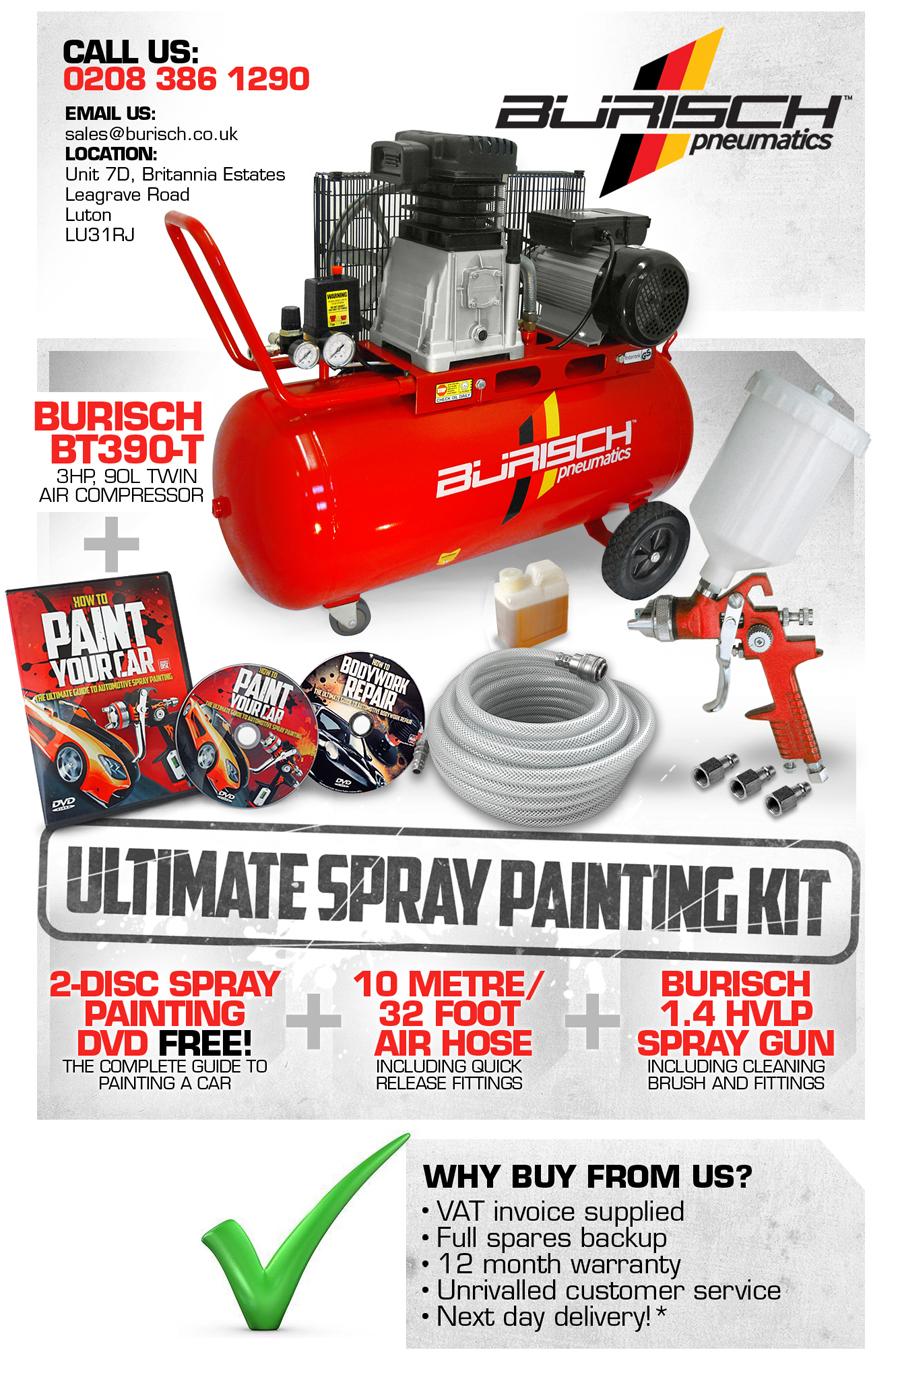 Burisch air compressor 90l hvlp spray gun 10m air hose for Car paint air compressor